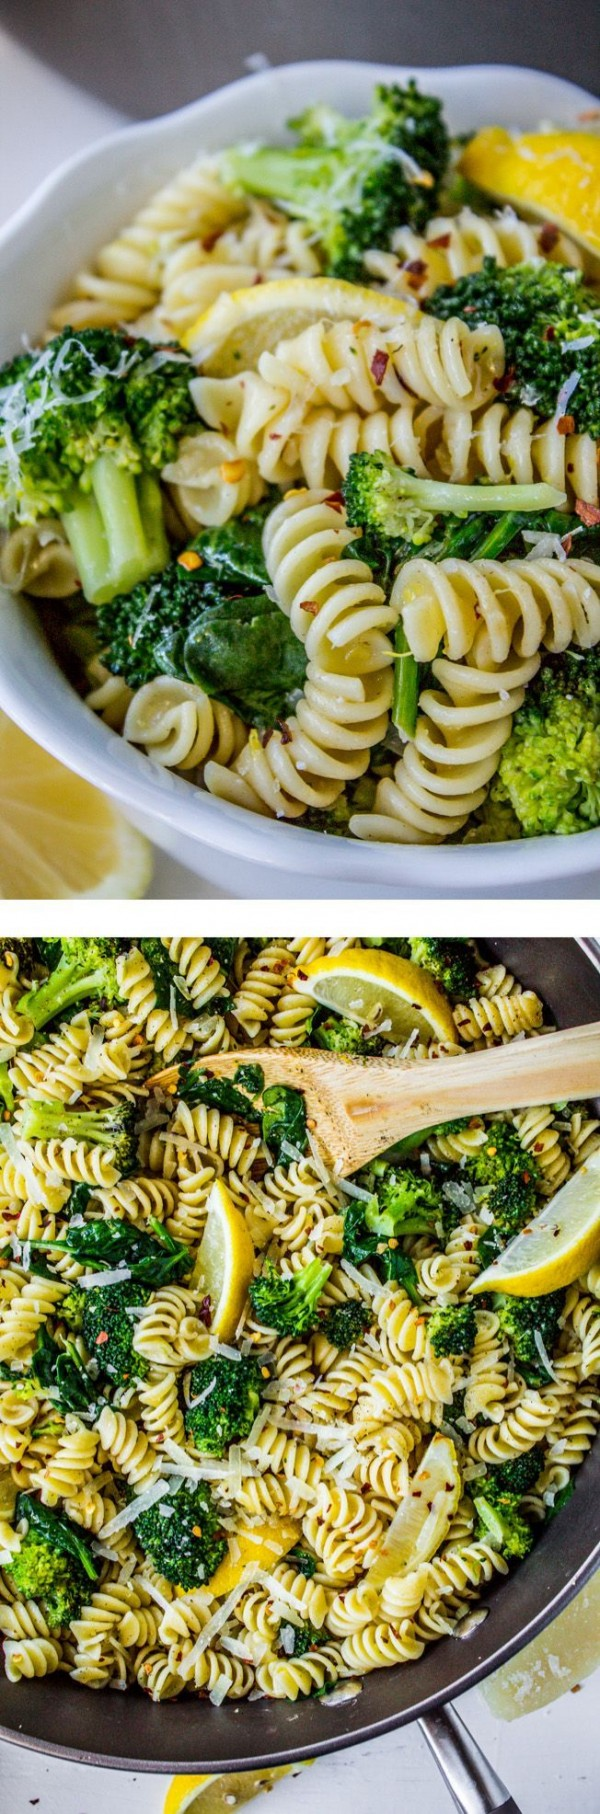 Get the recipe Lemon Broccoli Pasta Skillet @recipes_to_go